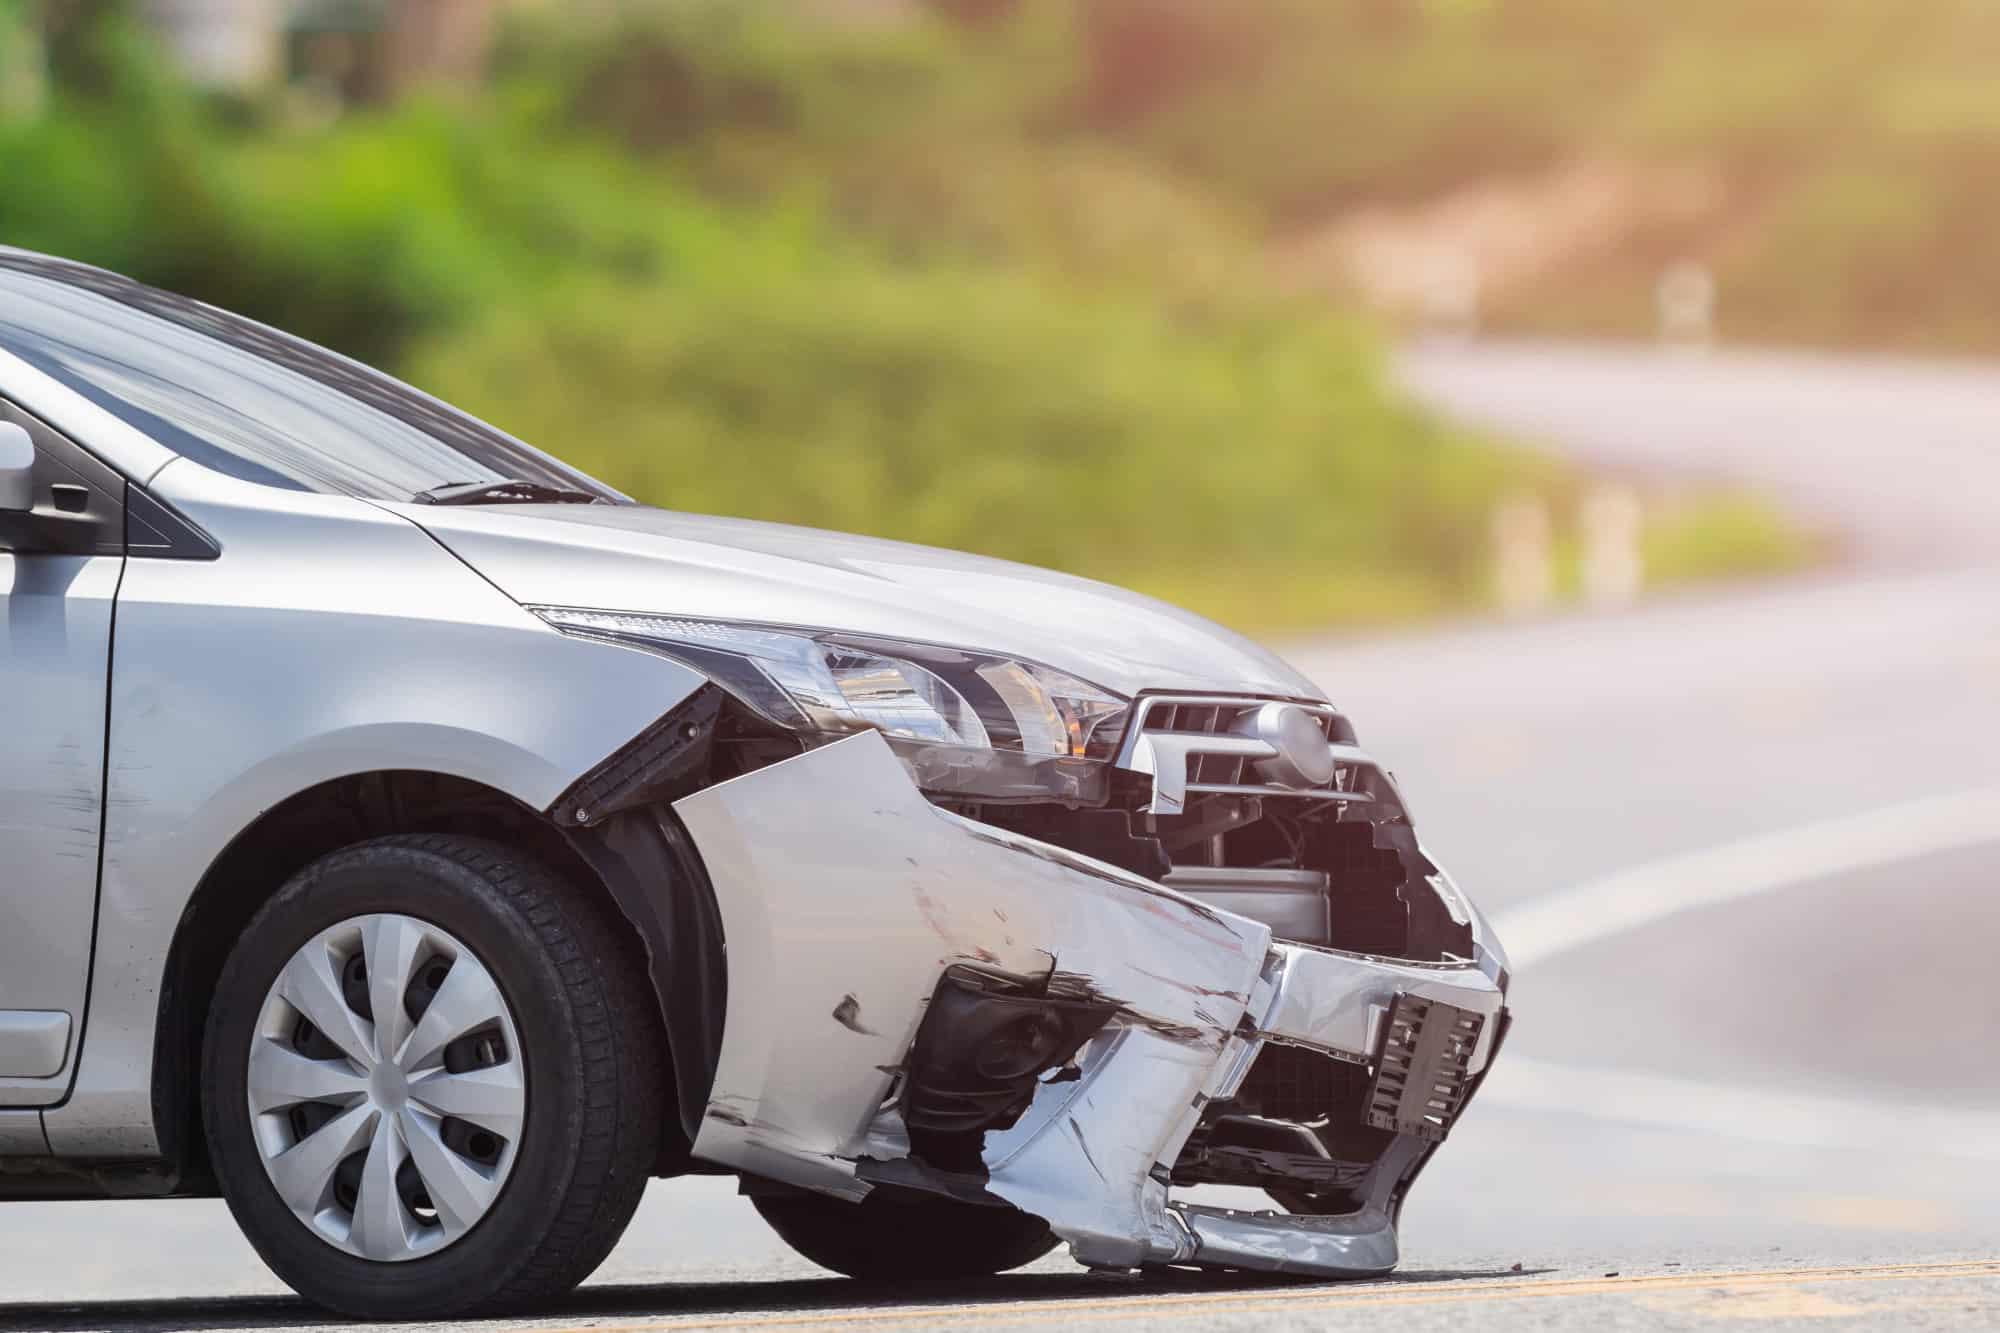 Serious Injury Two-Vehicle Crash on E University Drive Snarls Traffic [Tempe, AZ]